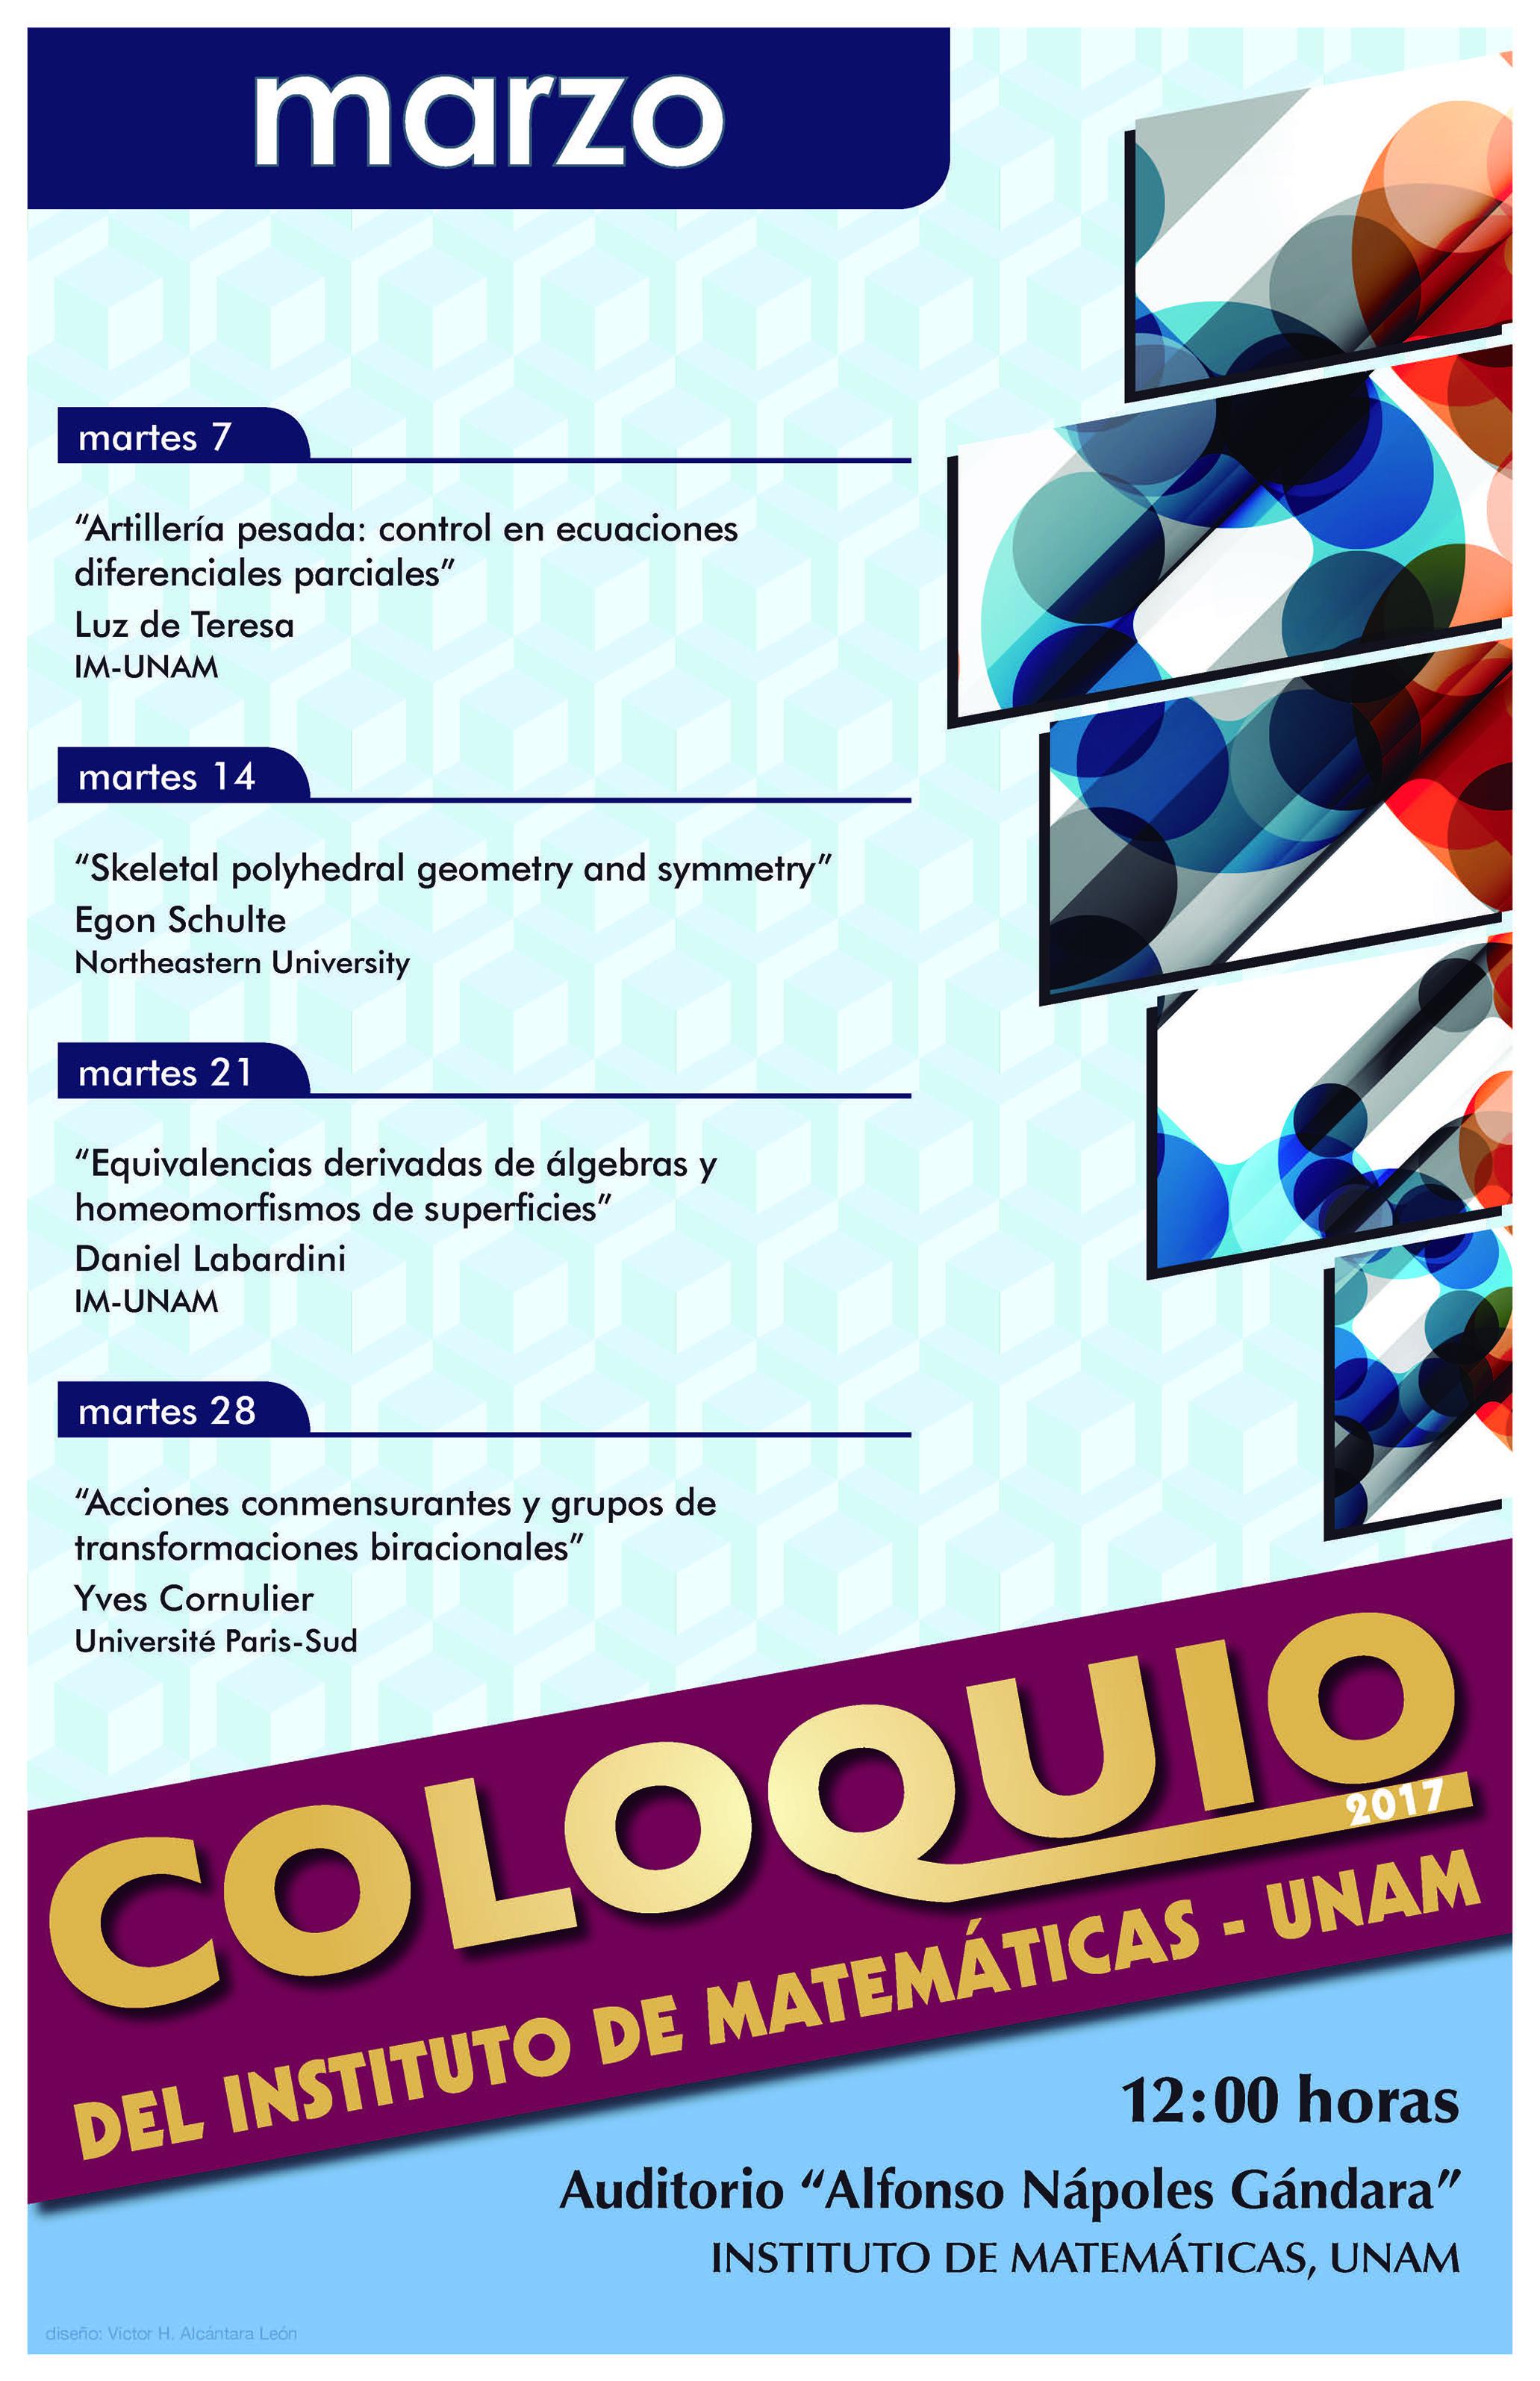 Marzo: Sesiones para Coloquio